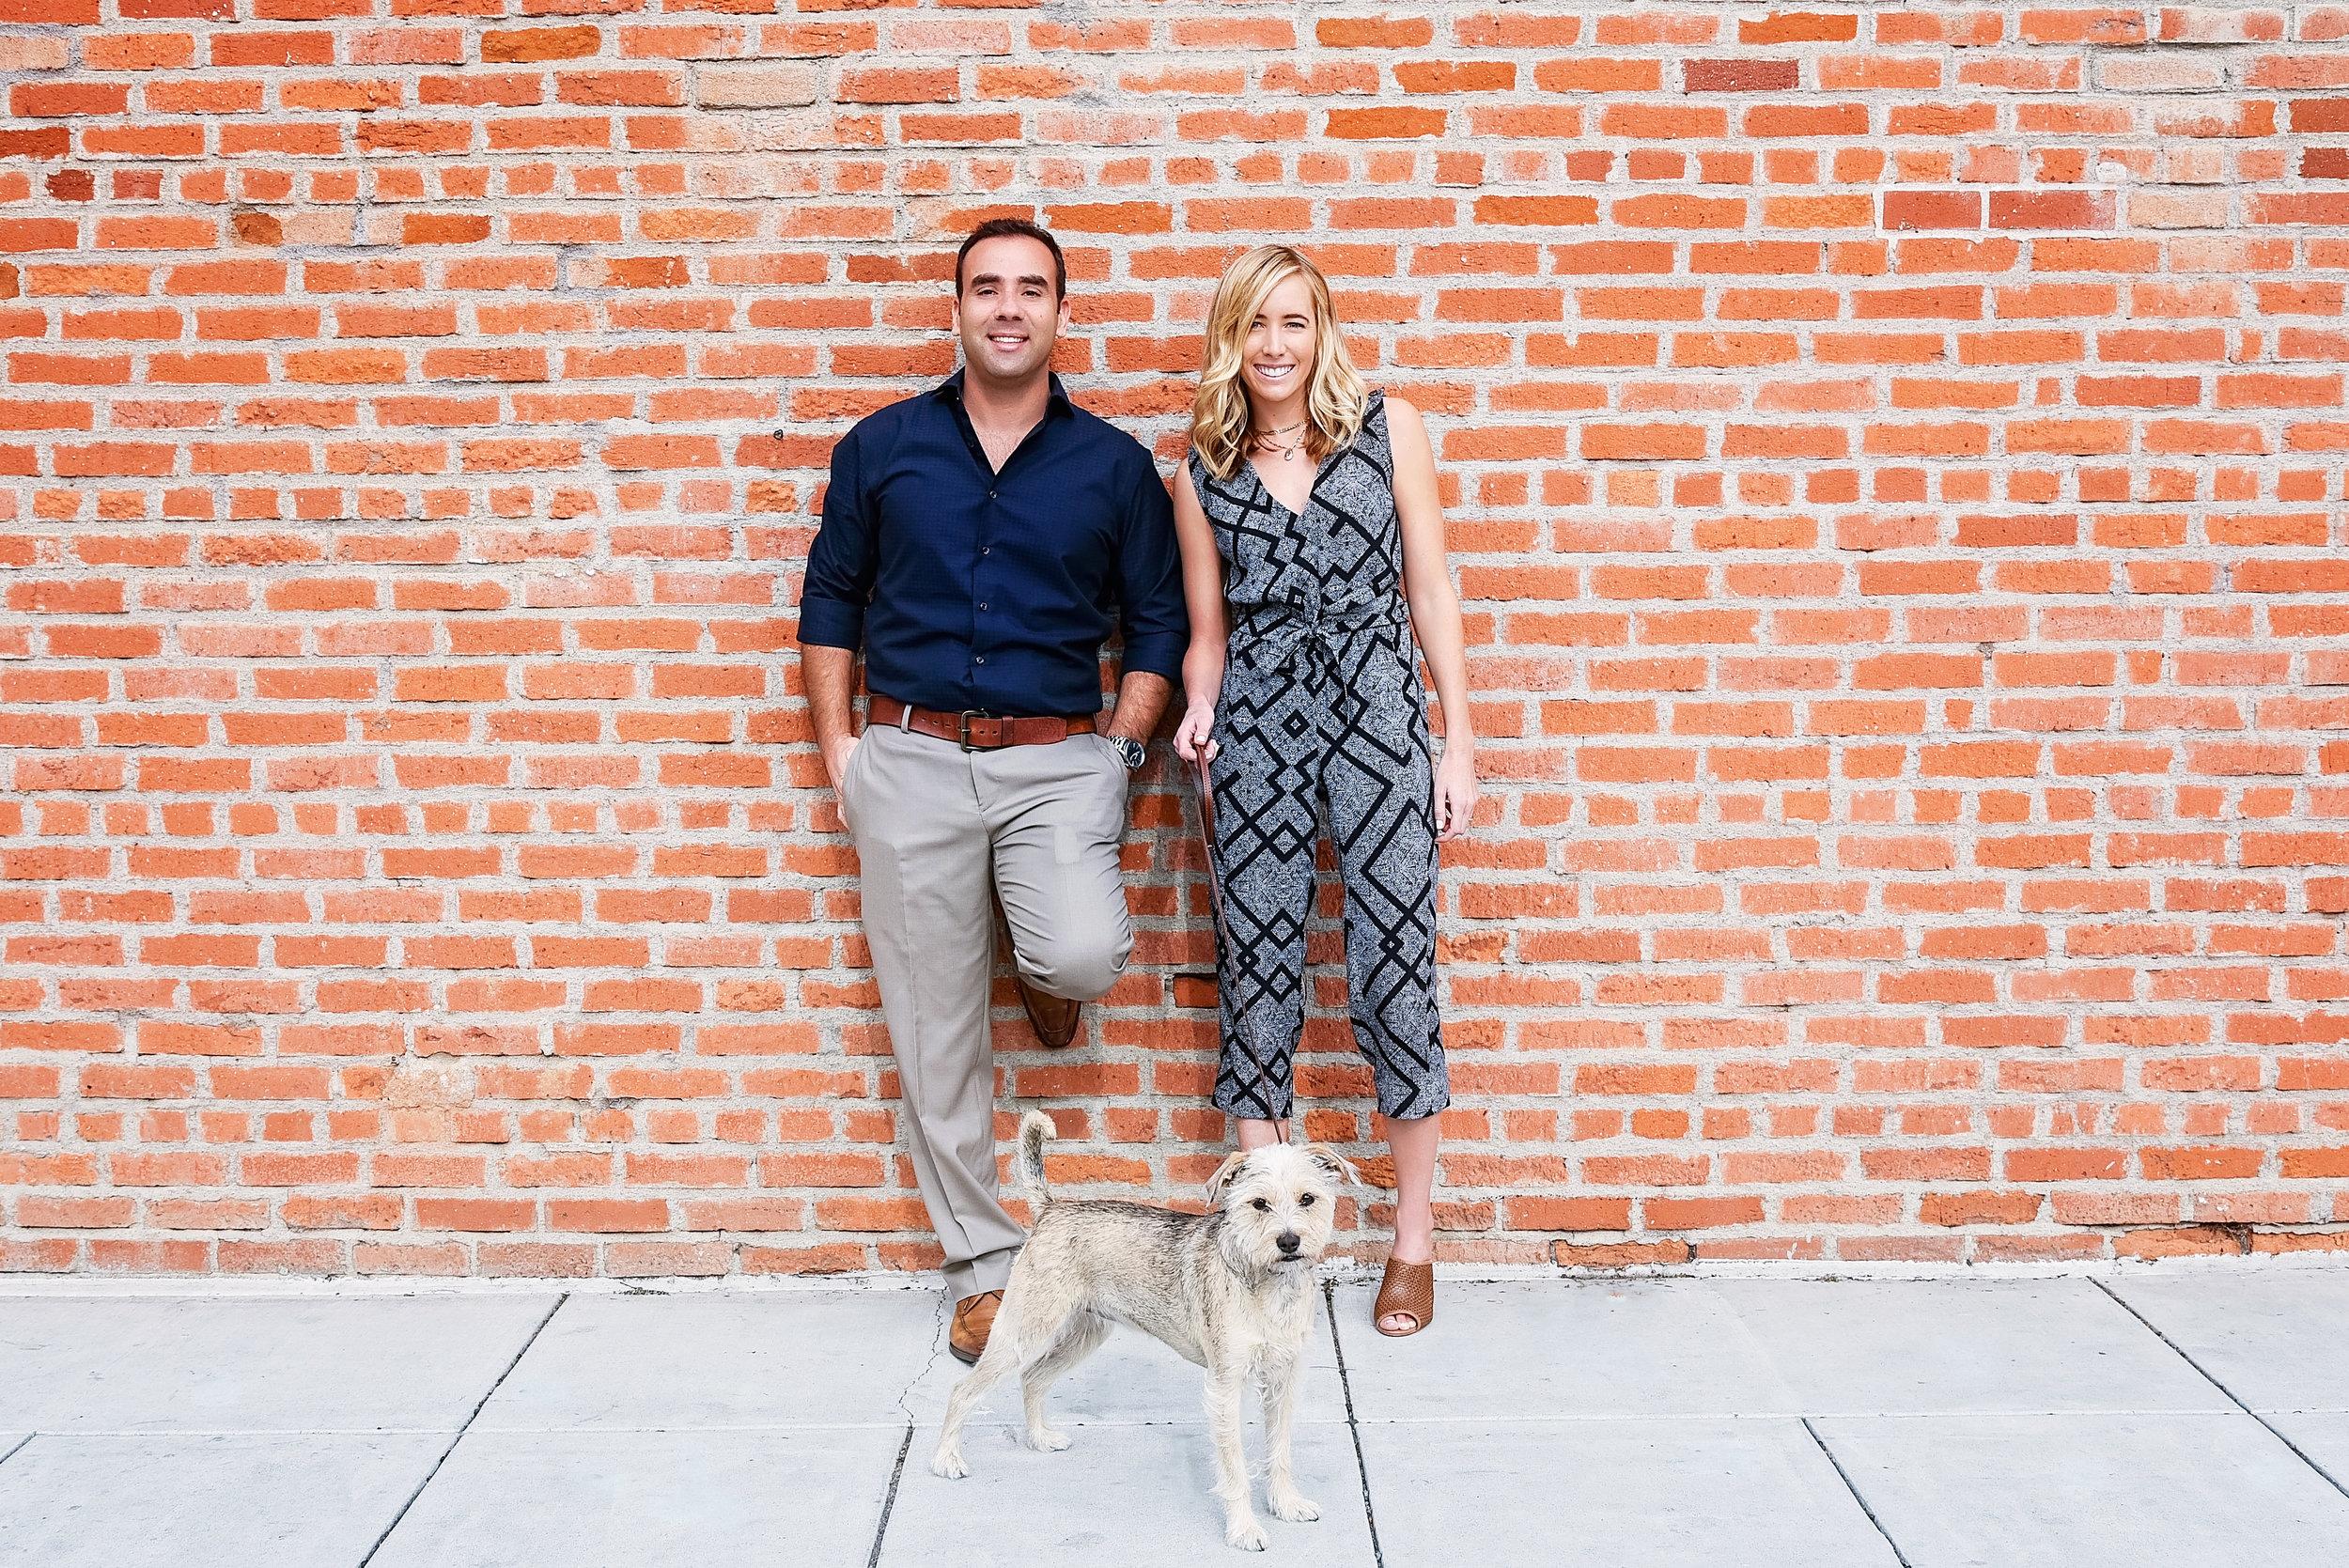 Lifestyle Portraits Couple  | Lifestyle Portrait Photography | Lacey O